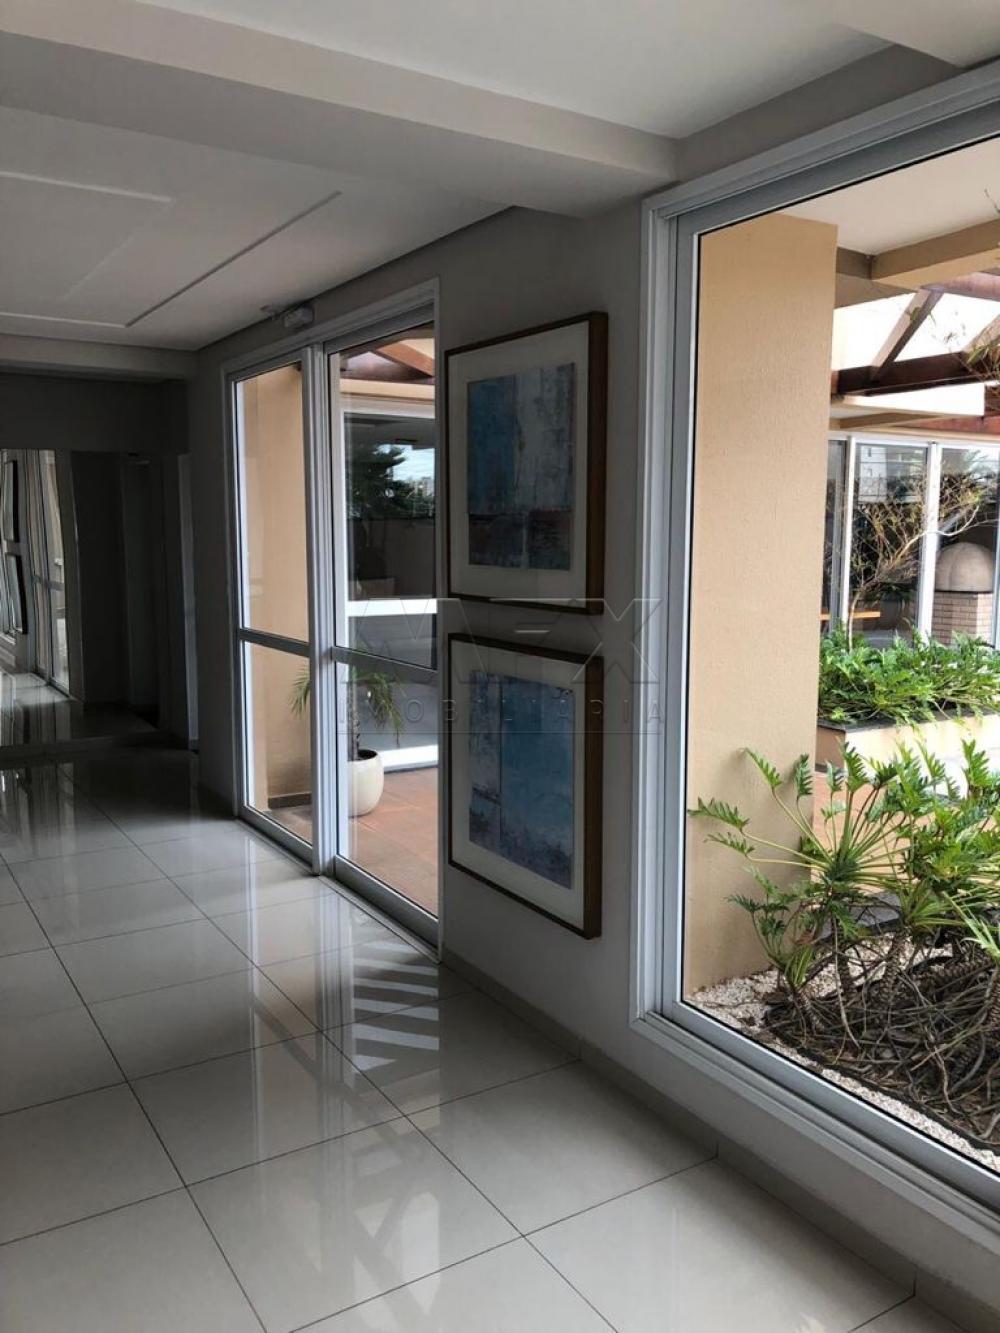 Comprar Apartamento / Duplex em Bauru R$ 700.000,00 - Foto 17